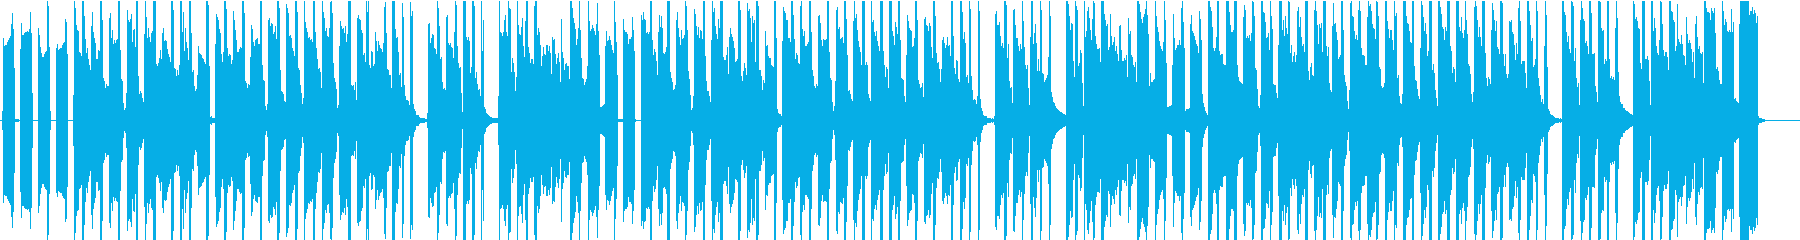 tiktok・猫が歌っている曲の再生済みの波形